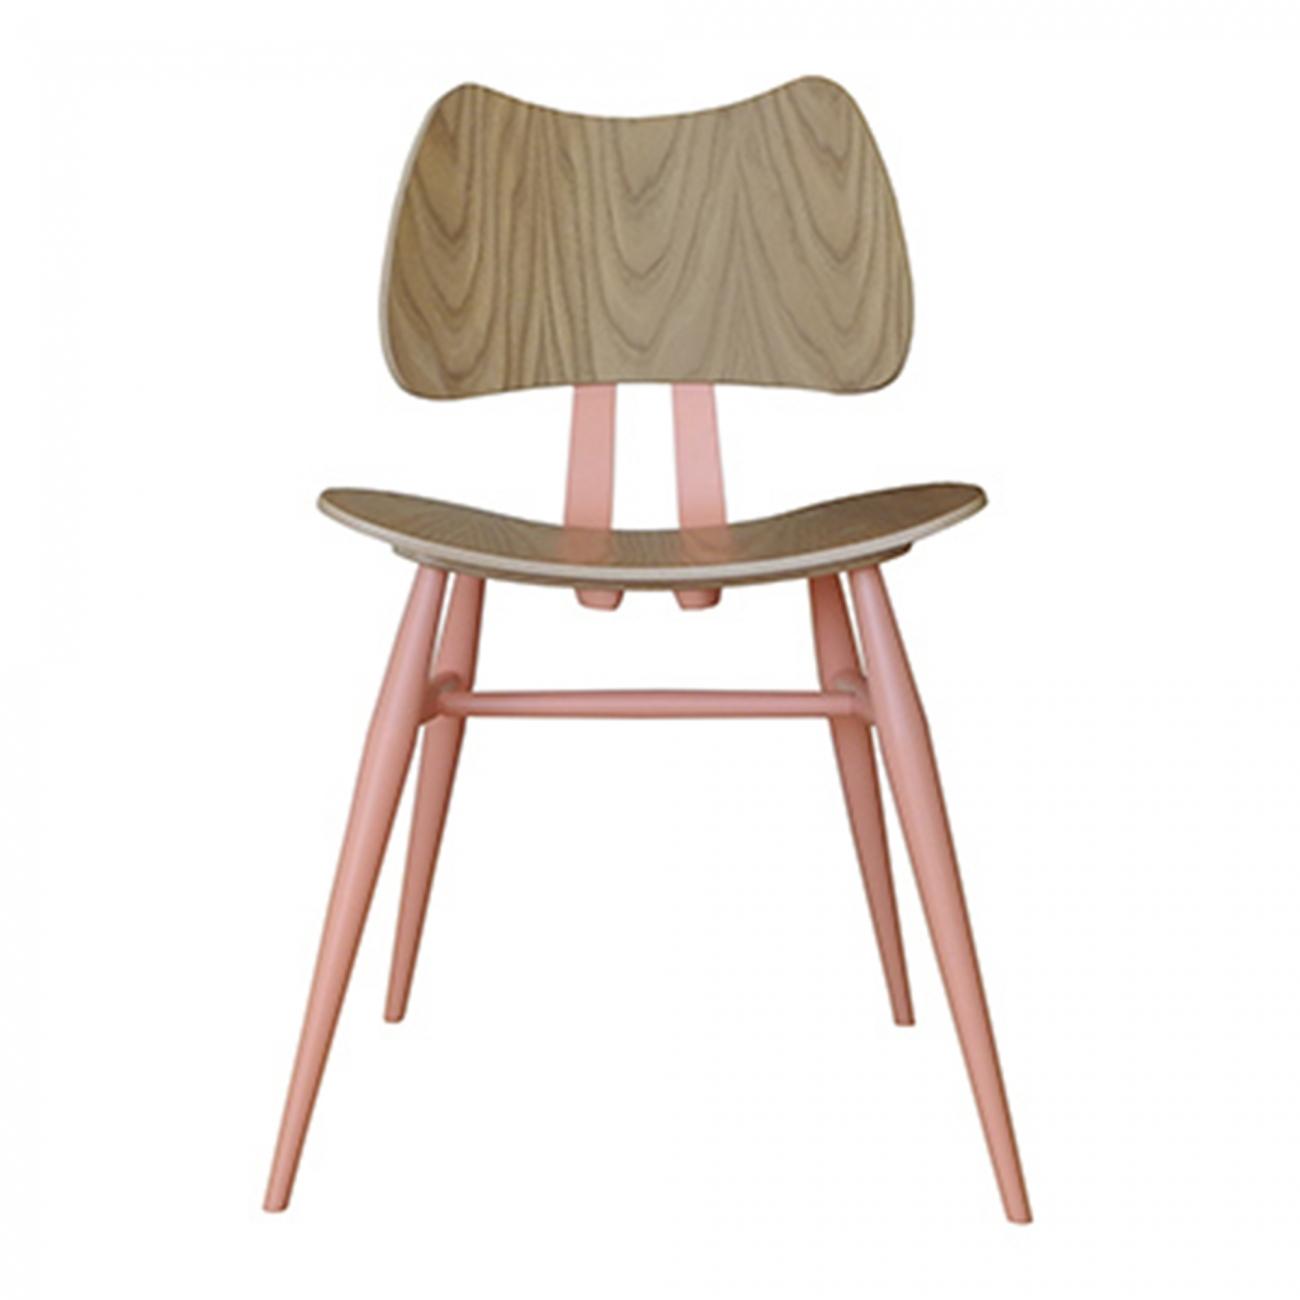 Ercol Butterfly Chair